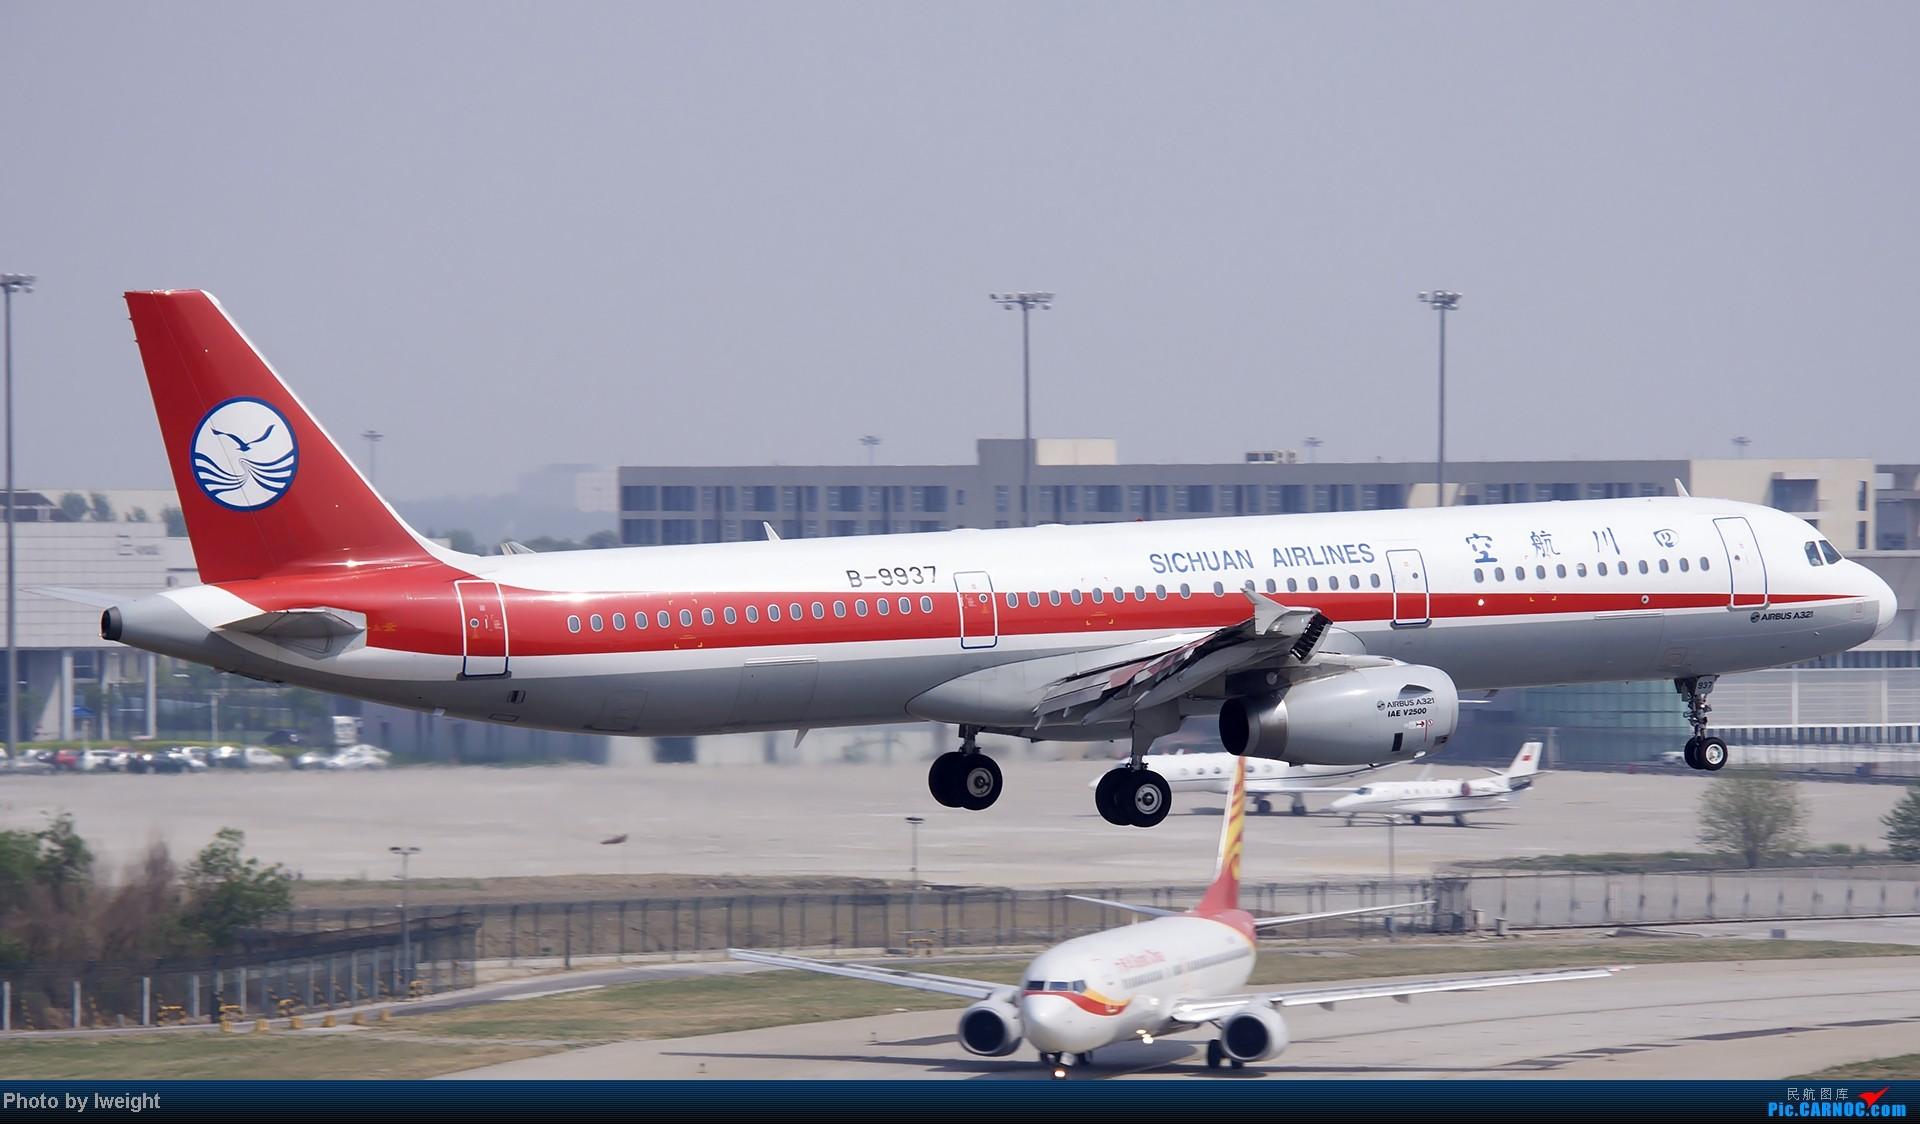 Re:[原创]错过了卡航的巴塞罗那号,只有这些大路货了,泪奔啊 AIRBUS A321-200 B-9937 中国北京首都机场